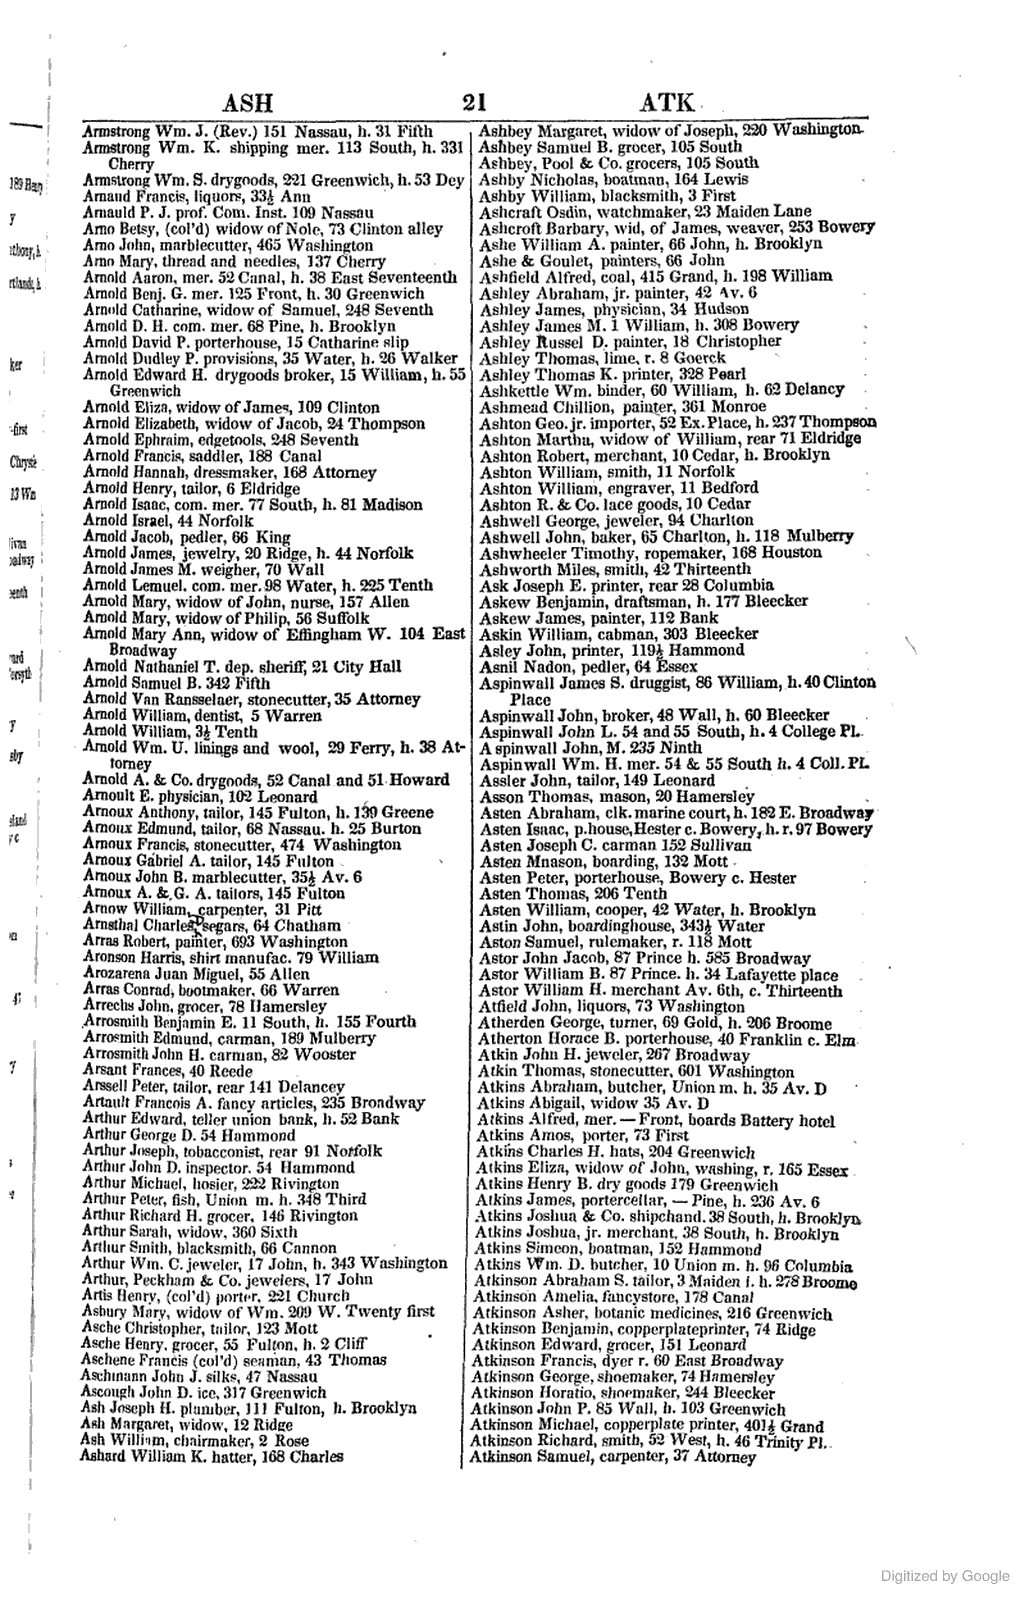 Asten Isaac Porterhouse Hester C Bowery H R 97 Bowery 1842 The New York City And Co Partnership Directory New York City York New York